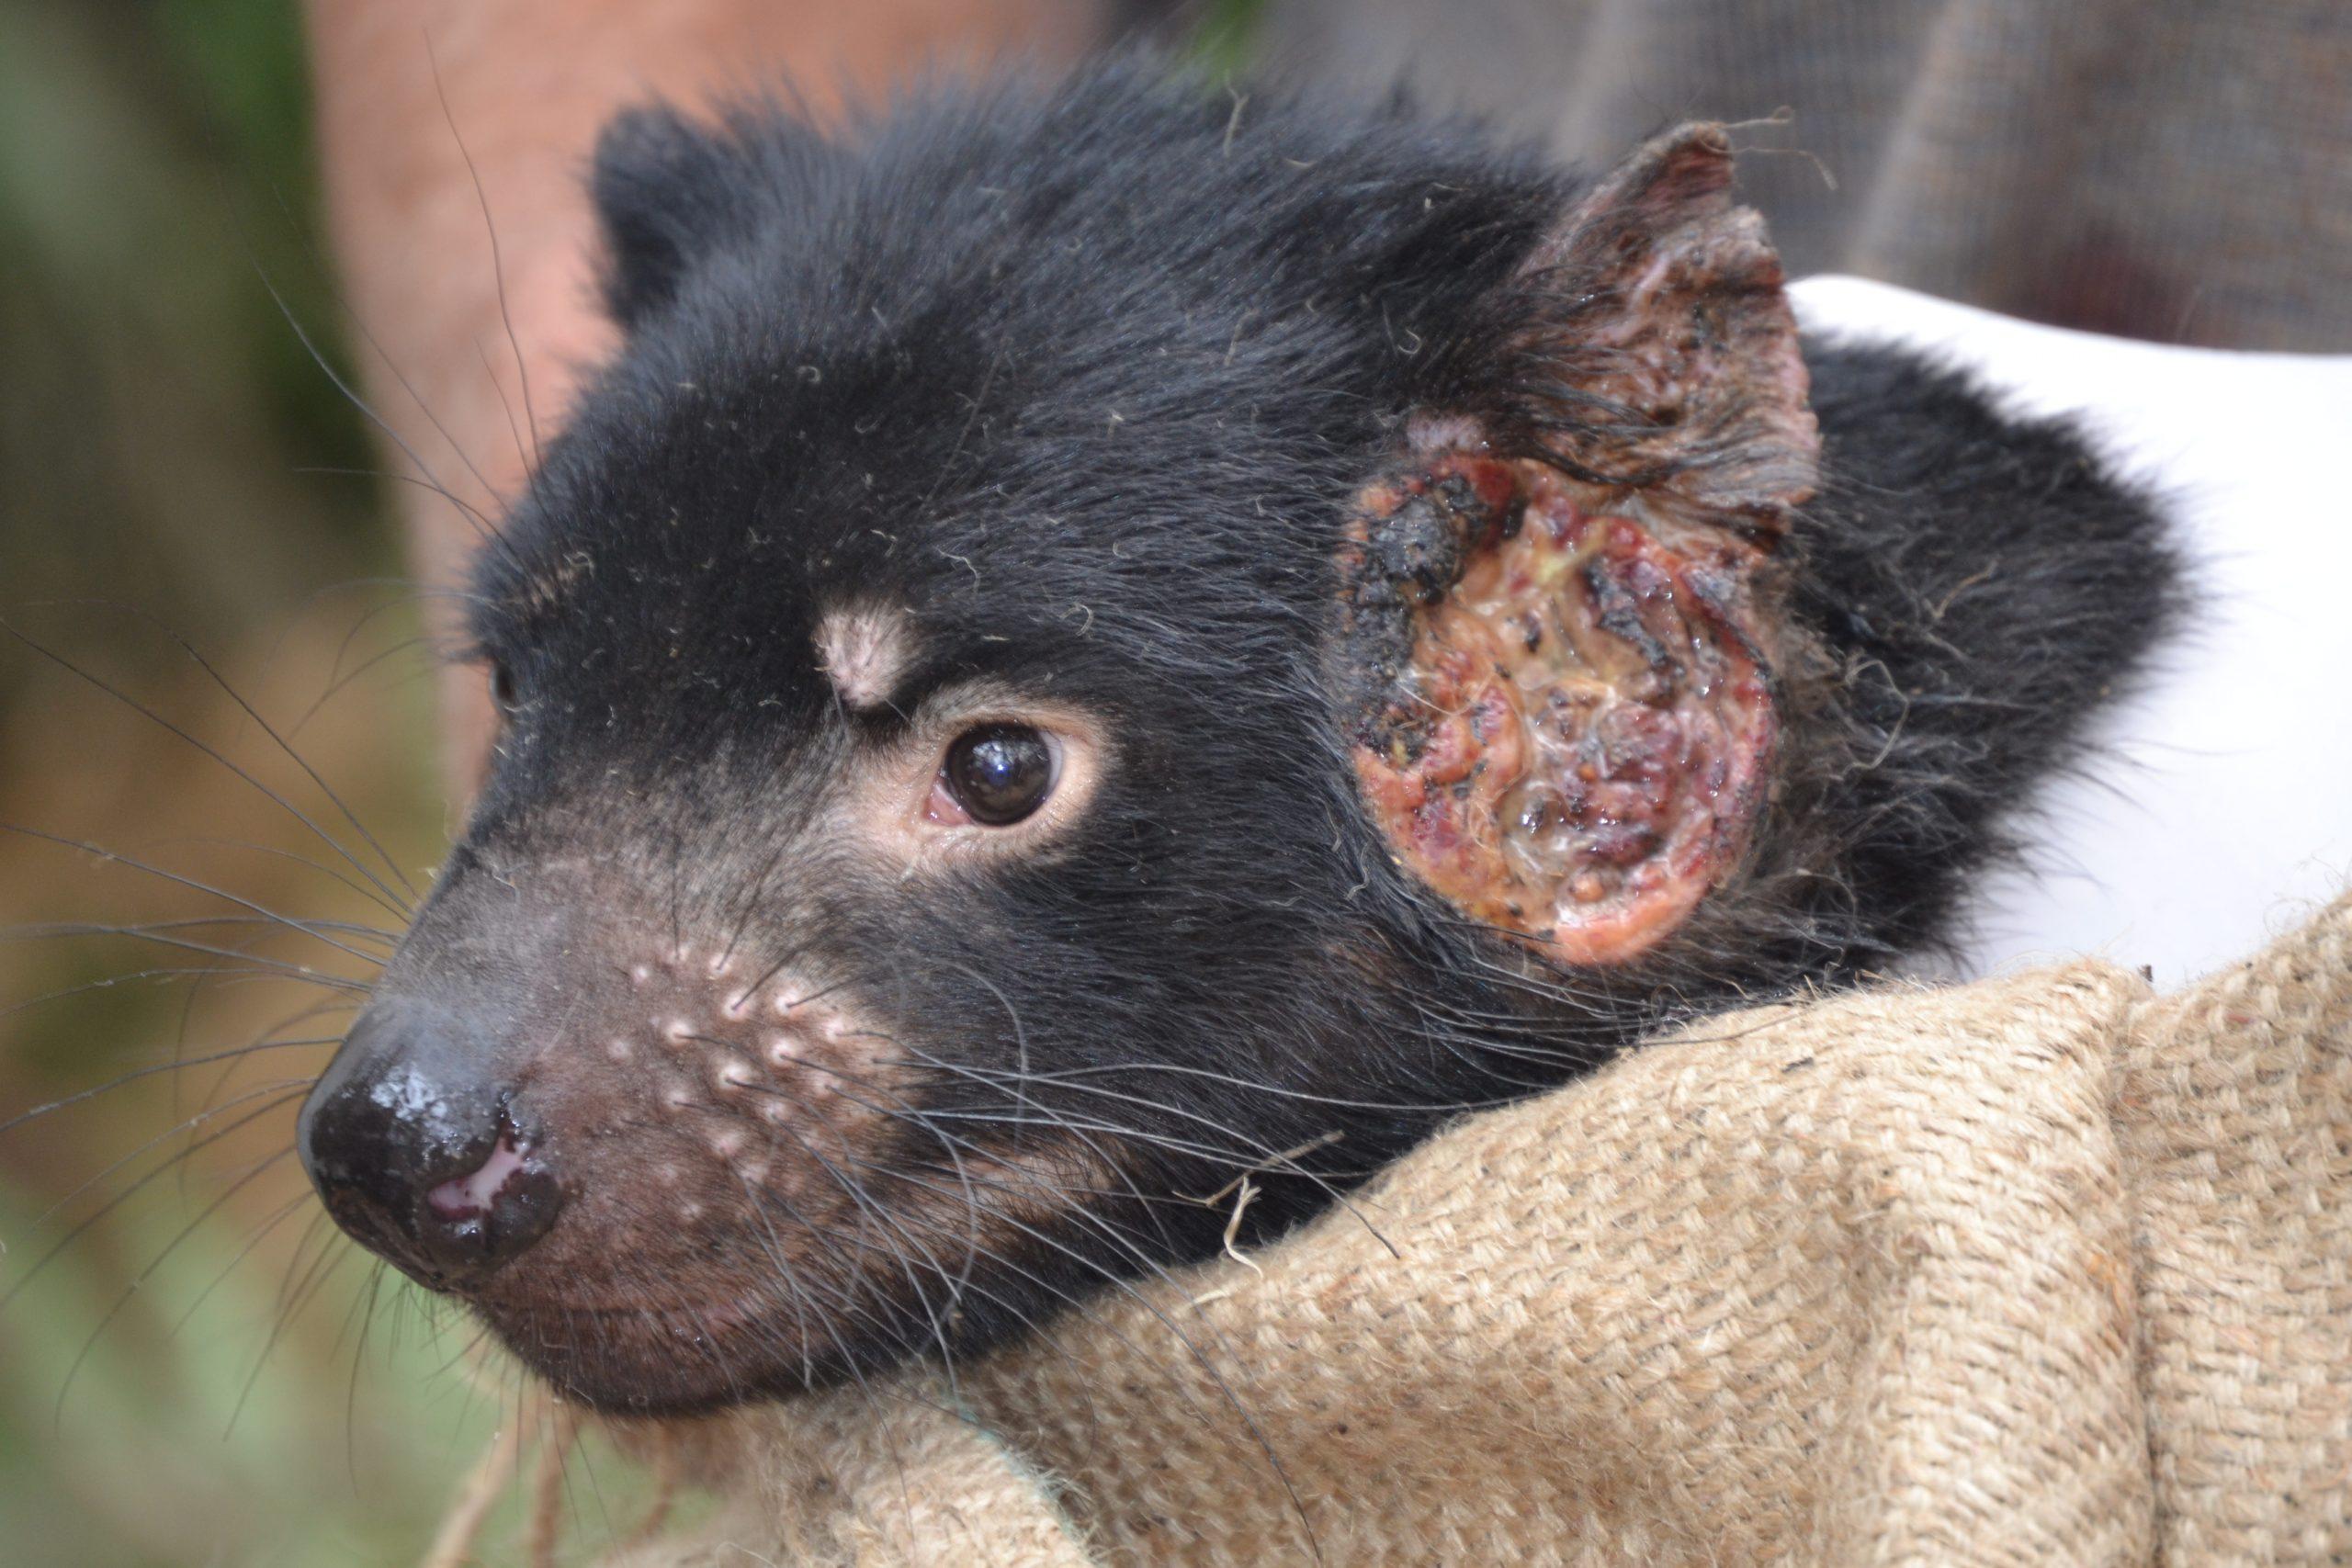 Human drugs could treat transmissible cancers in Tasmanian devils